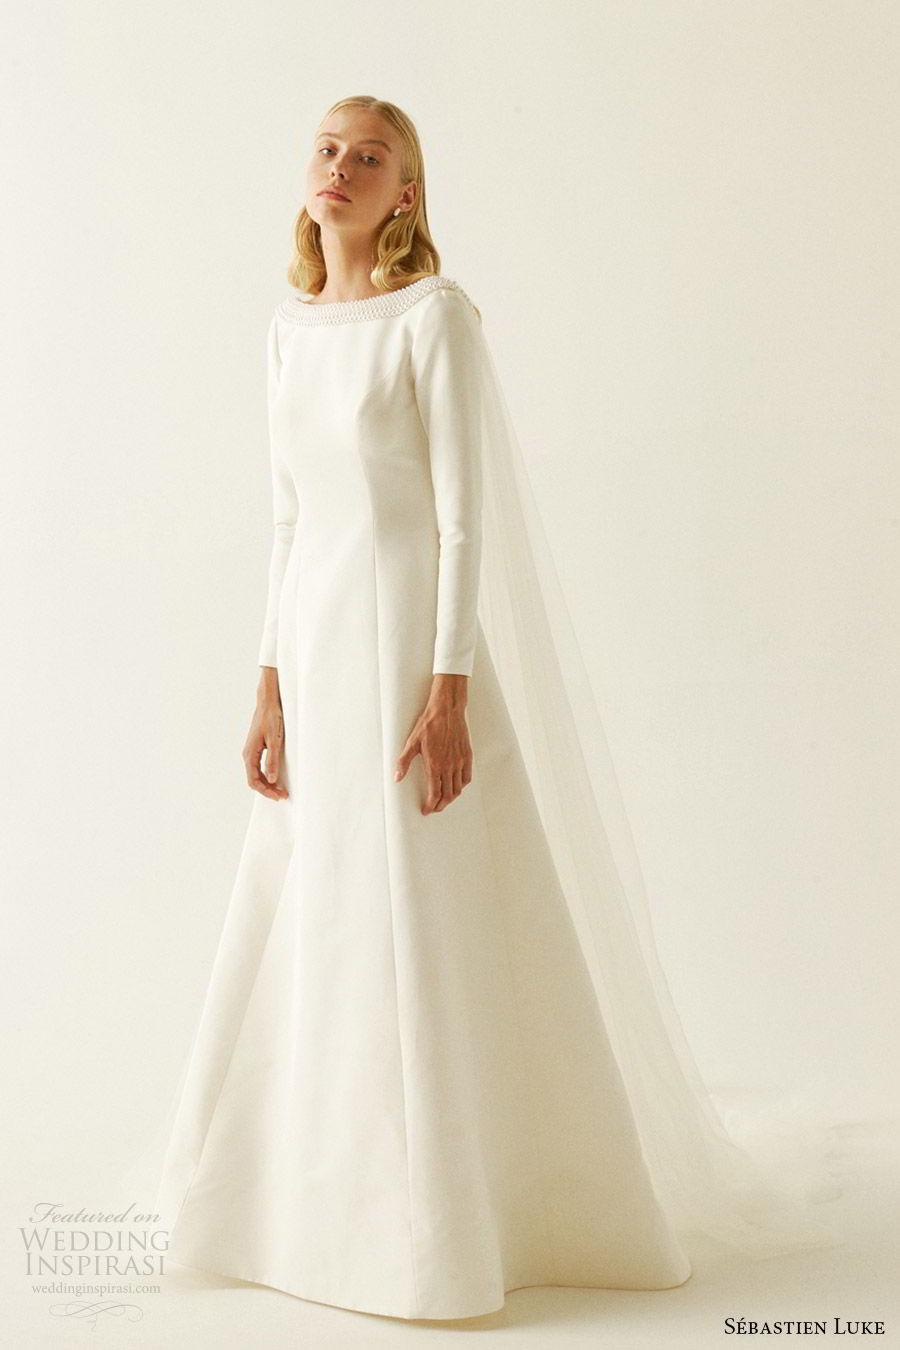 sebastien luke fall 2019 bridal jewel neckline long sleeves minimal embellishment modified a line wedding dress pockets cape clean simple modern (4) mv